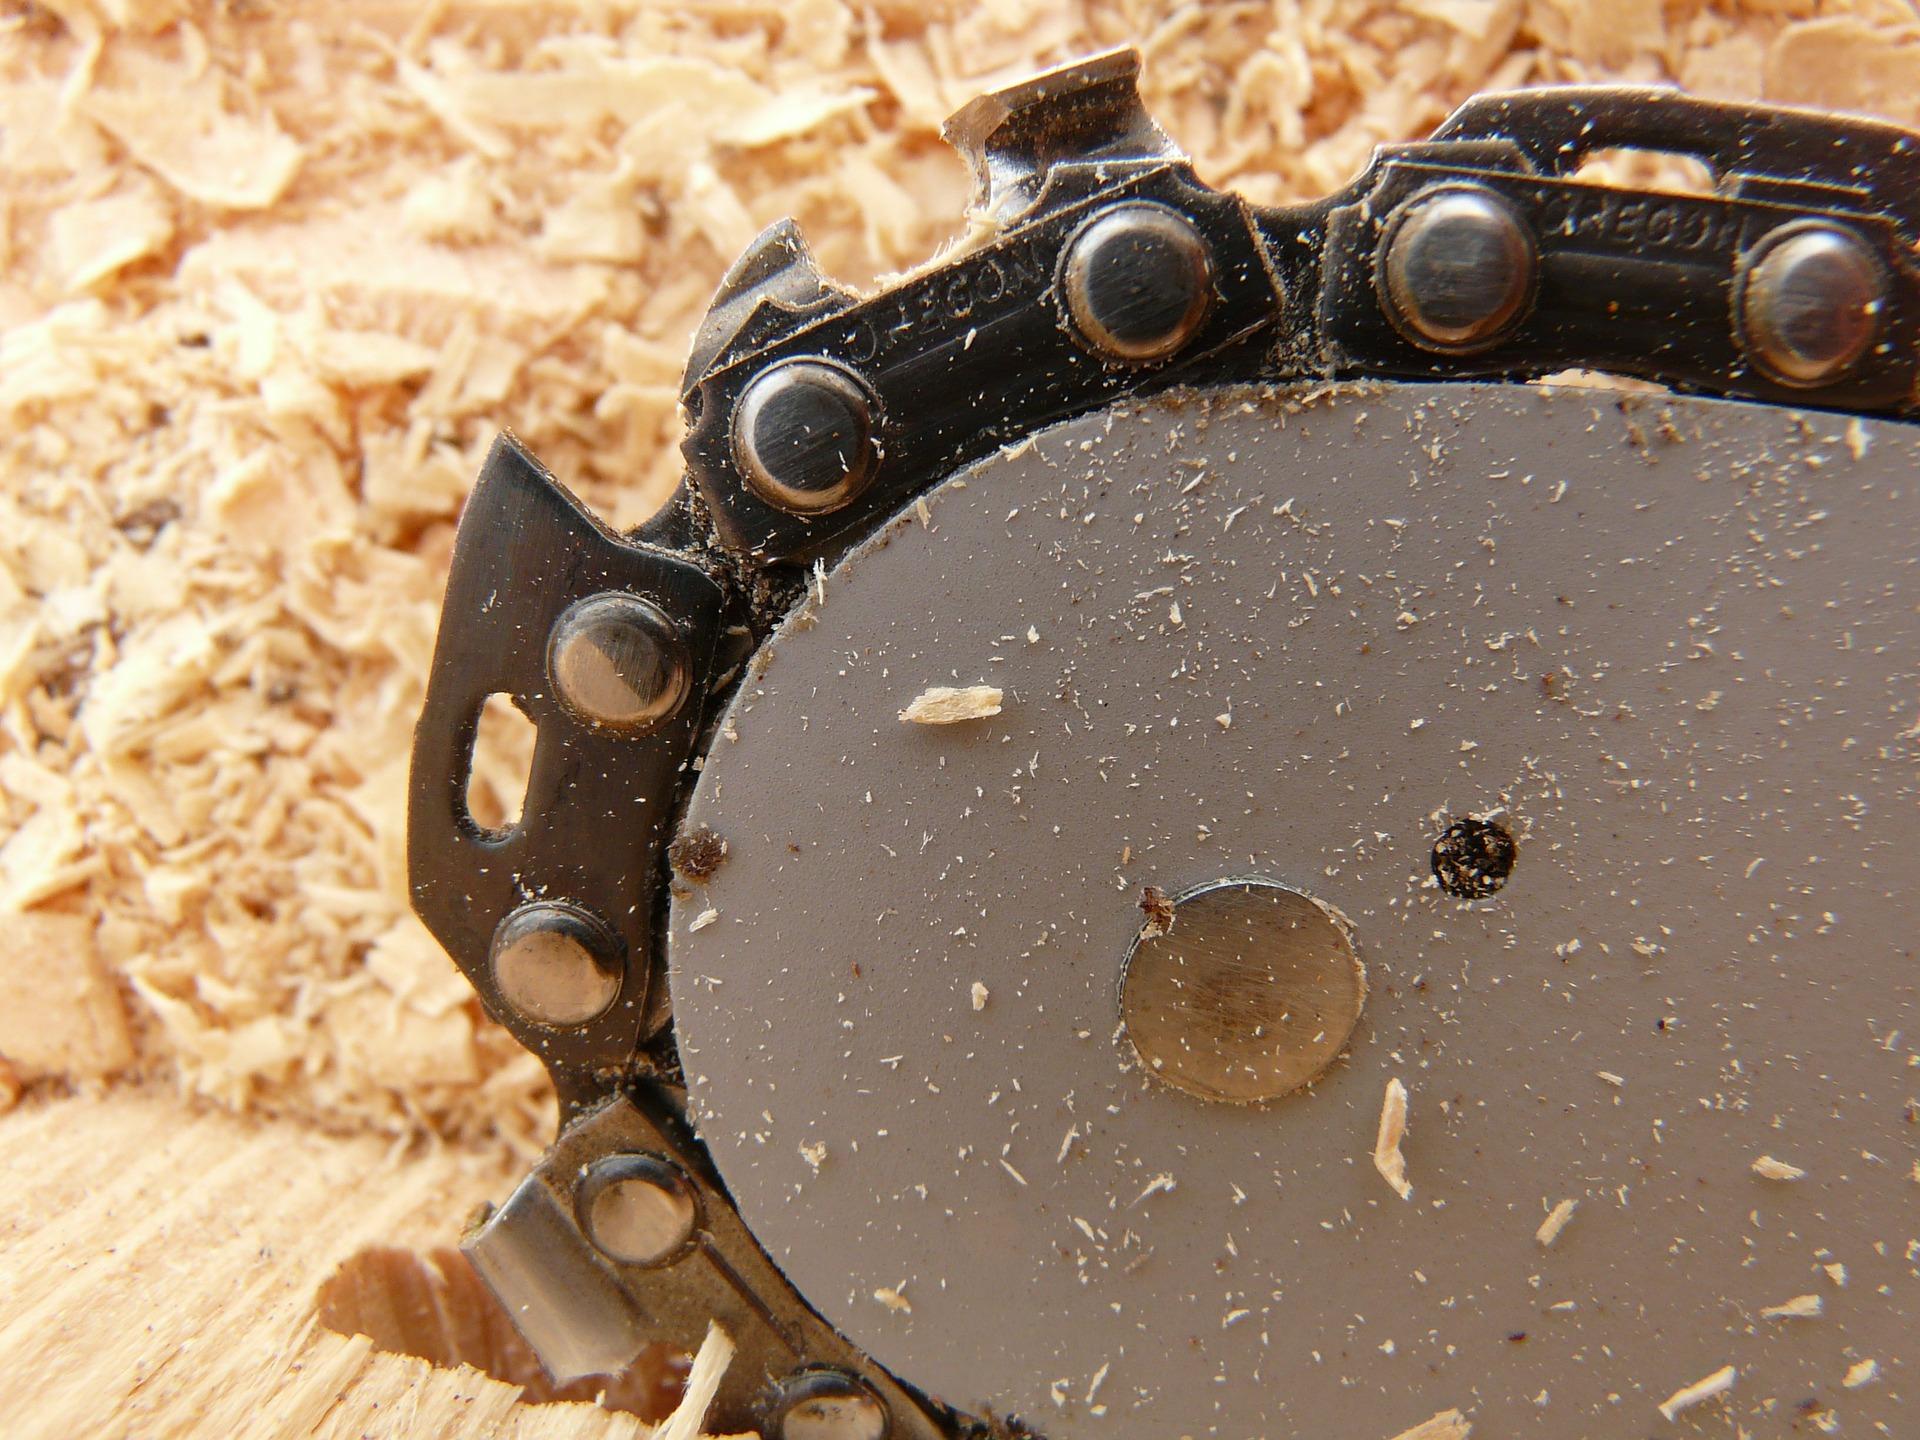 Brennholzsaege oft die Kettensaege